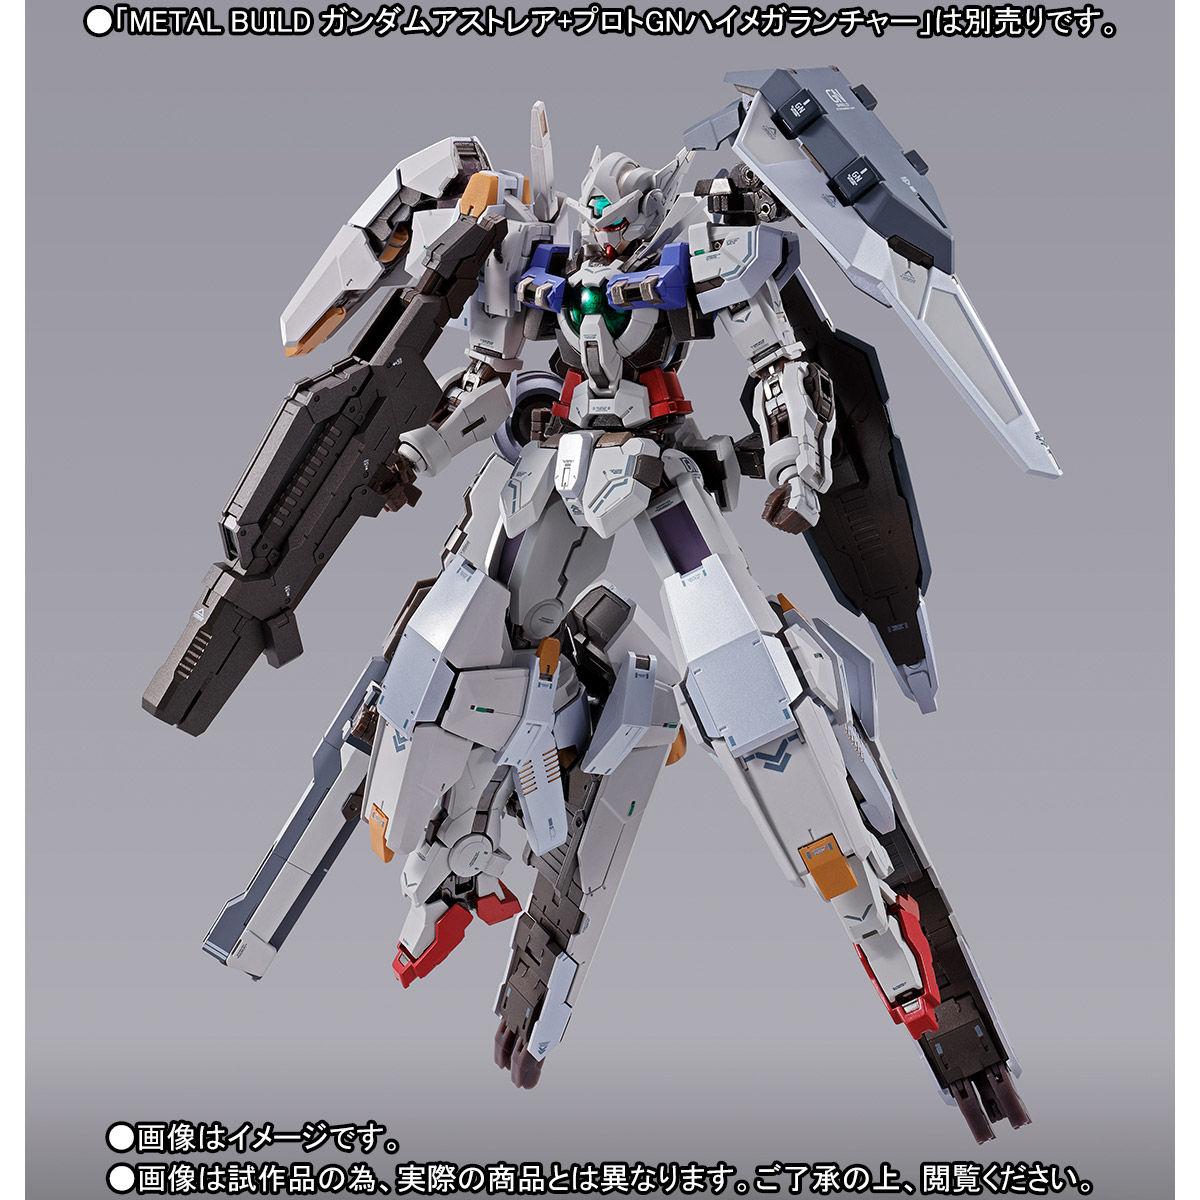 METAL BUILD『ガンダムアストレア用高機動試験装備』機動戦士ガンダム00P 可動フィギュア-008